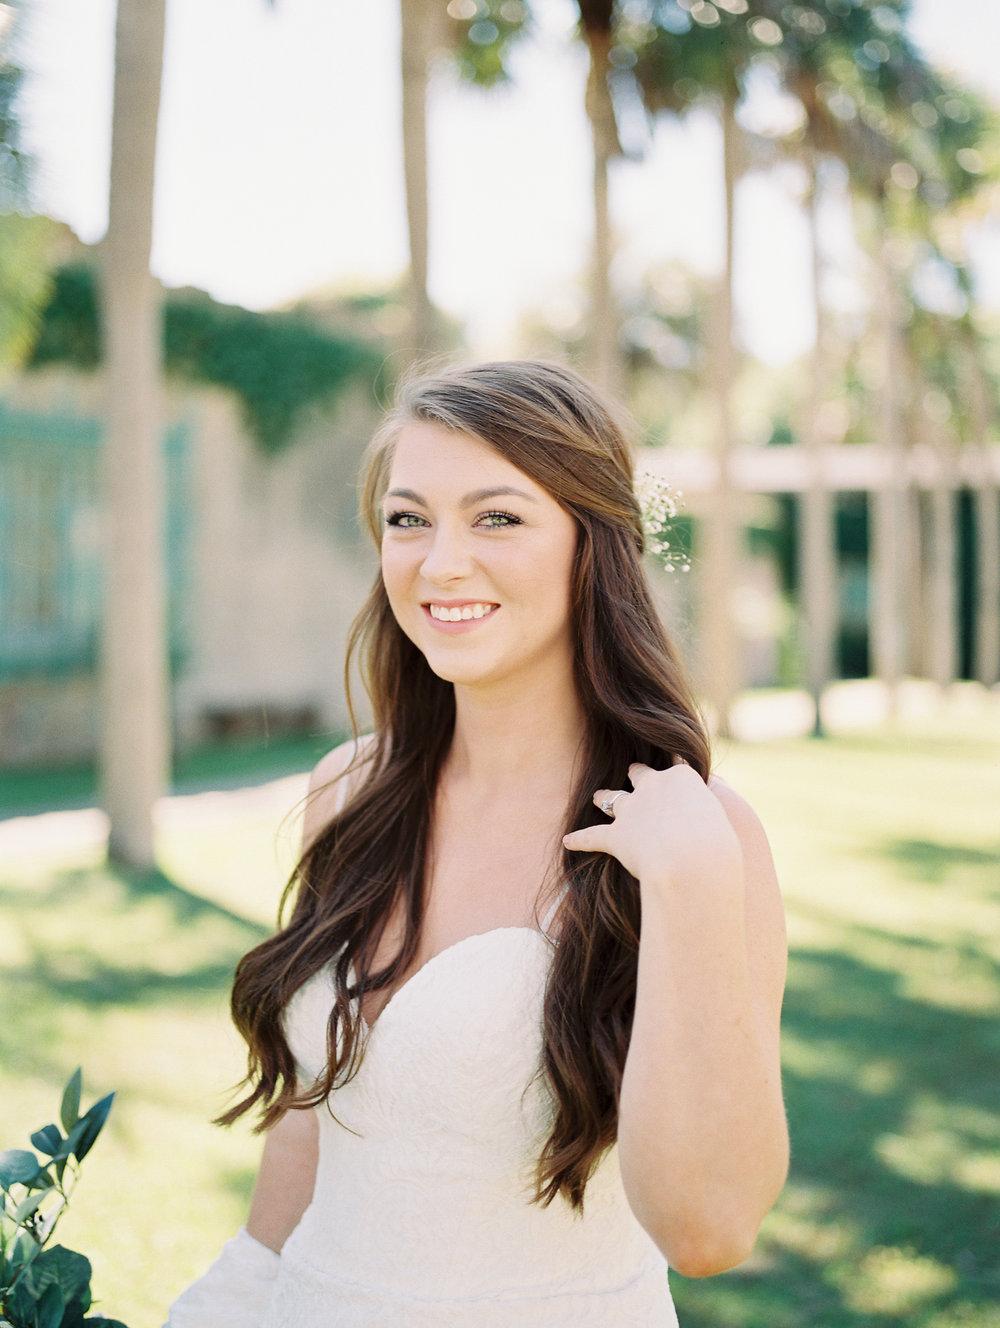 Bridal Session: Allison's Atalaya Castle Wedding Portraits | Palmetto State Weddings